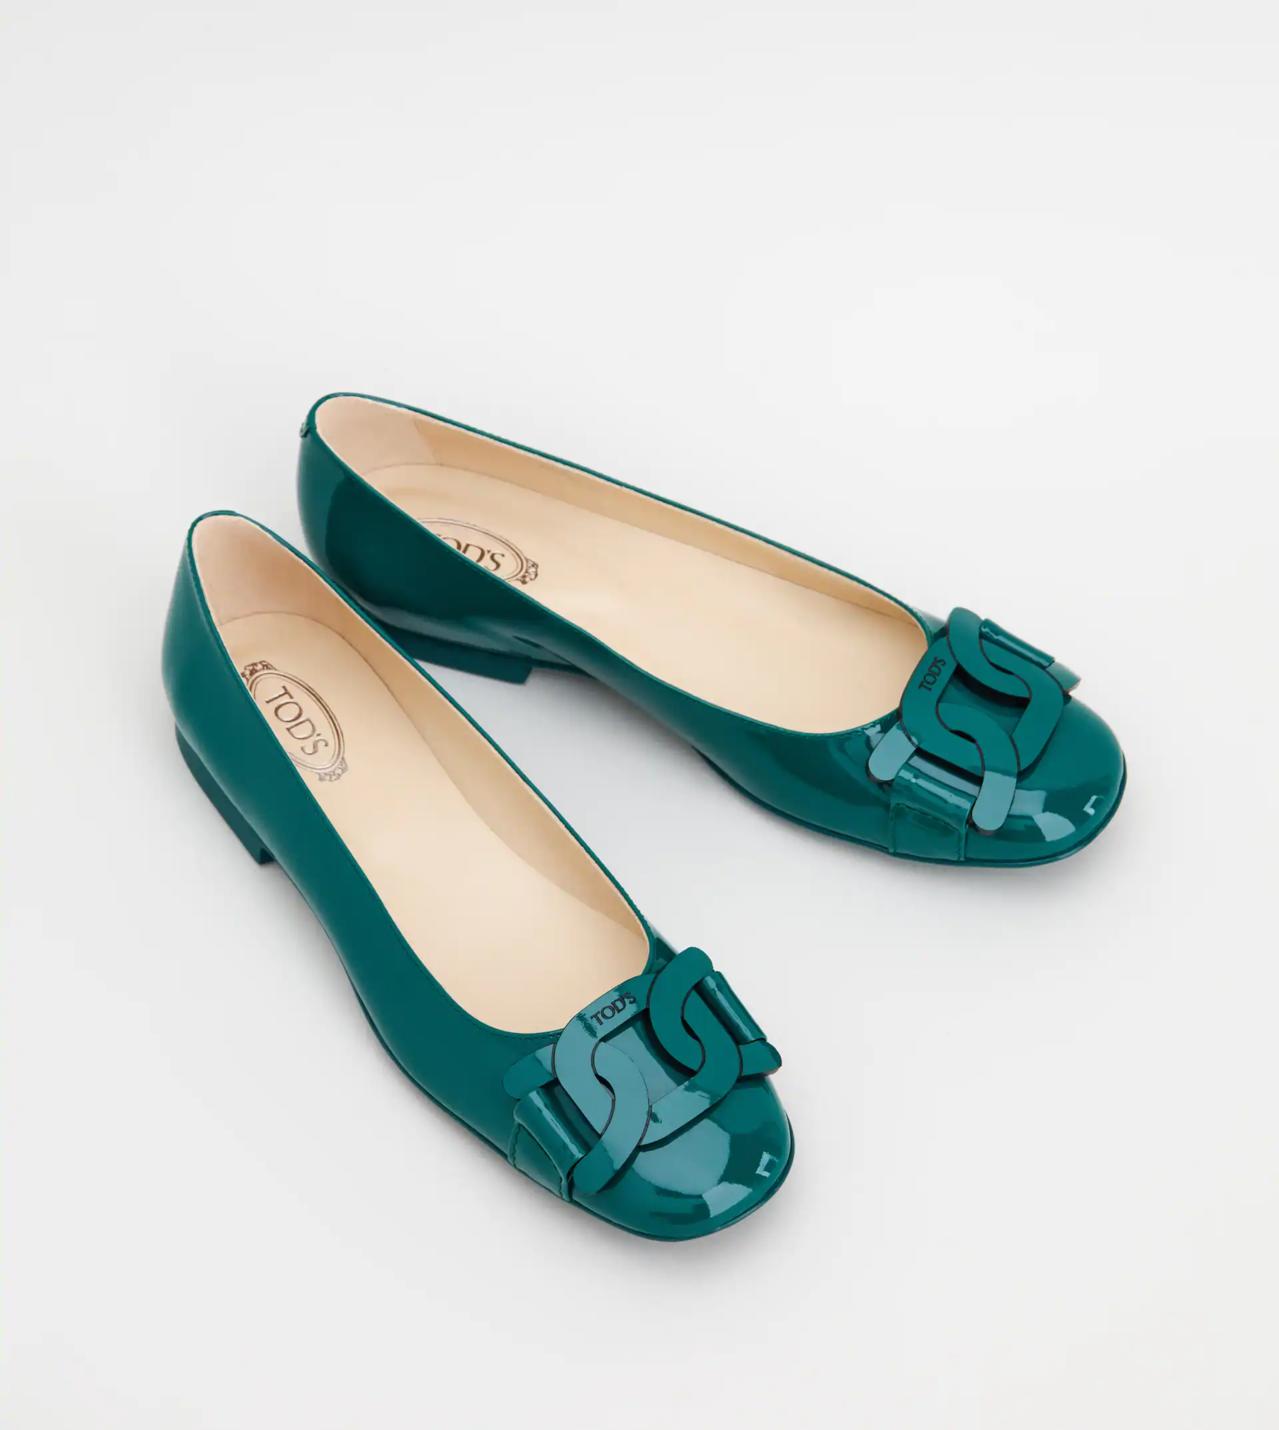 Tod's Kate綠色漆皮平底鞋,18,100元。 圖/迪生提供